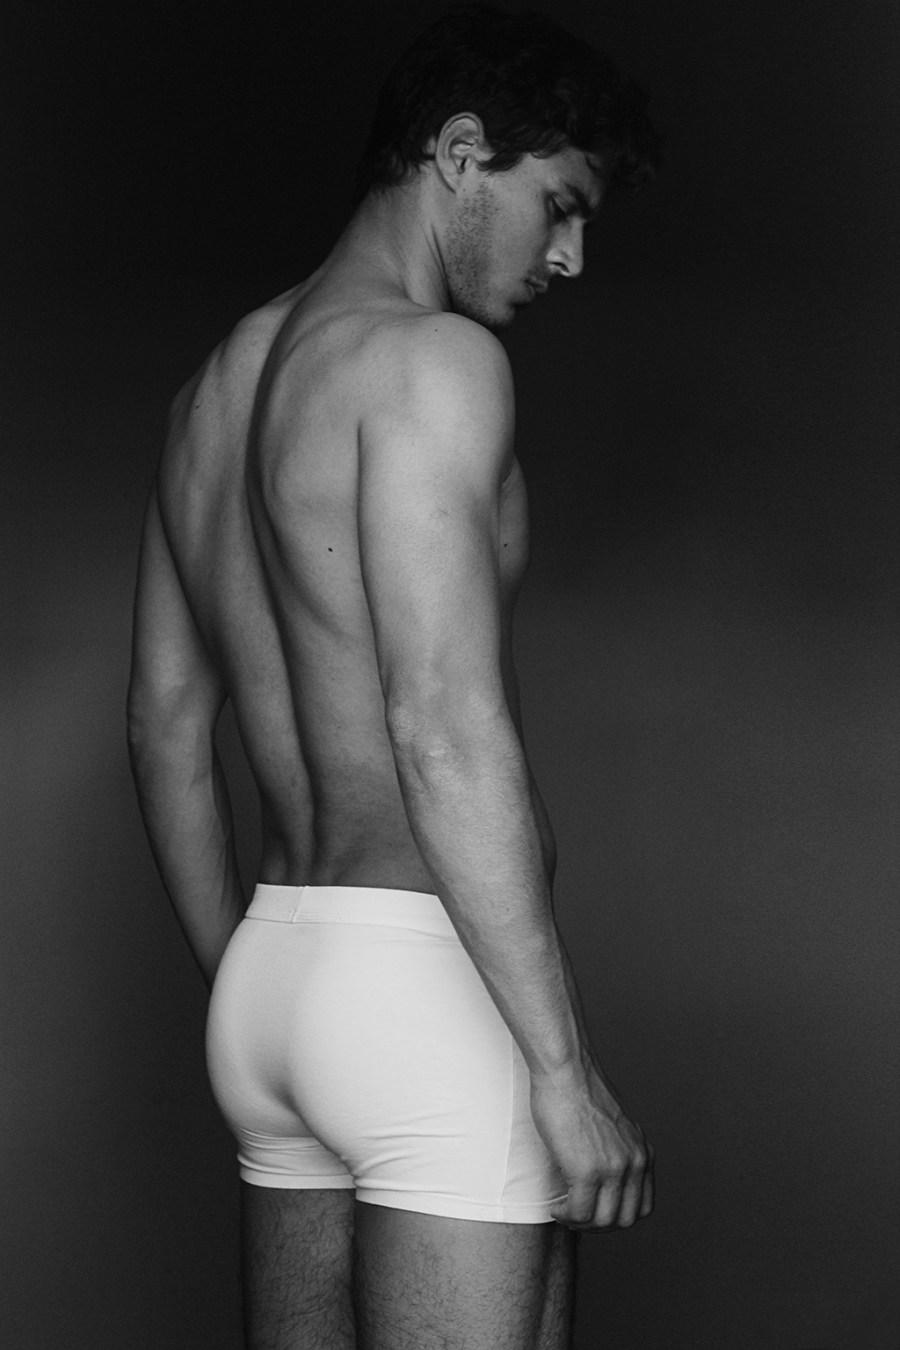 Steven Brocos by Miguel Zaragozá for Fashionably Male